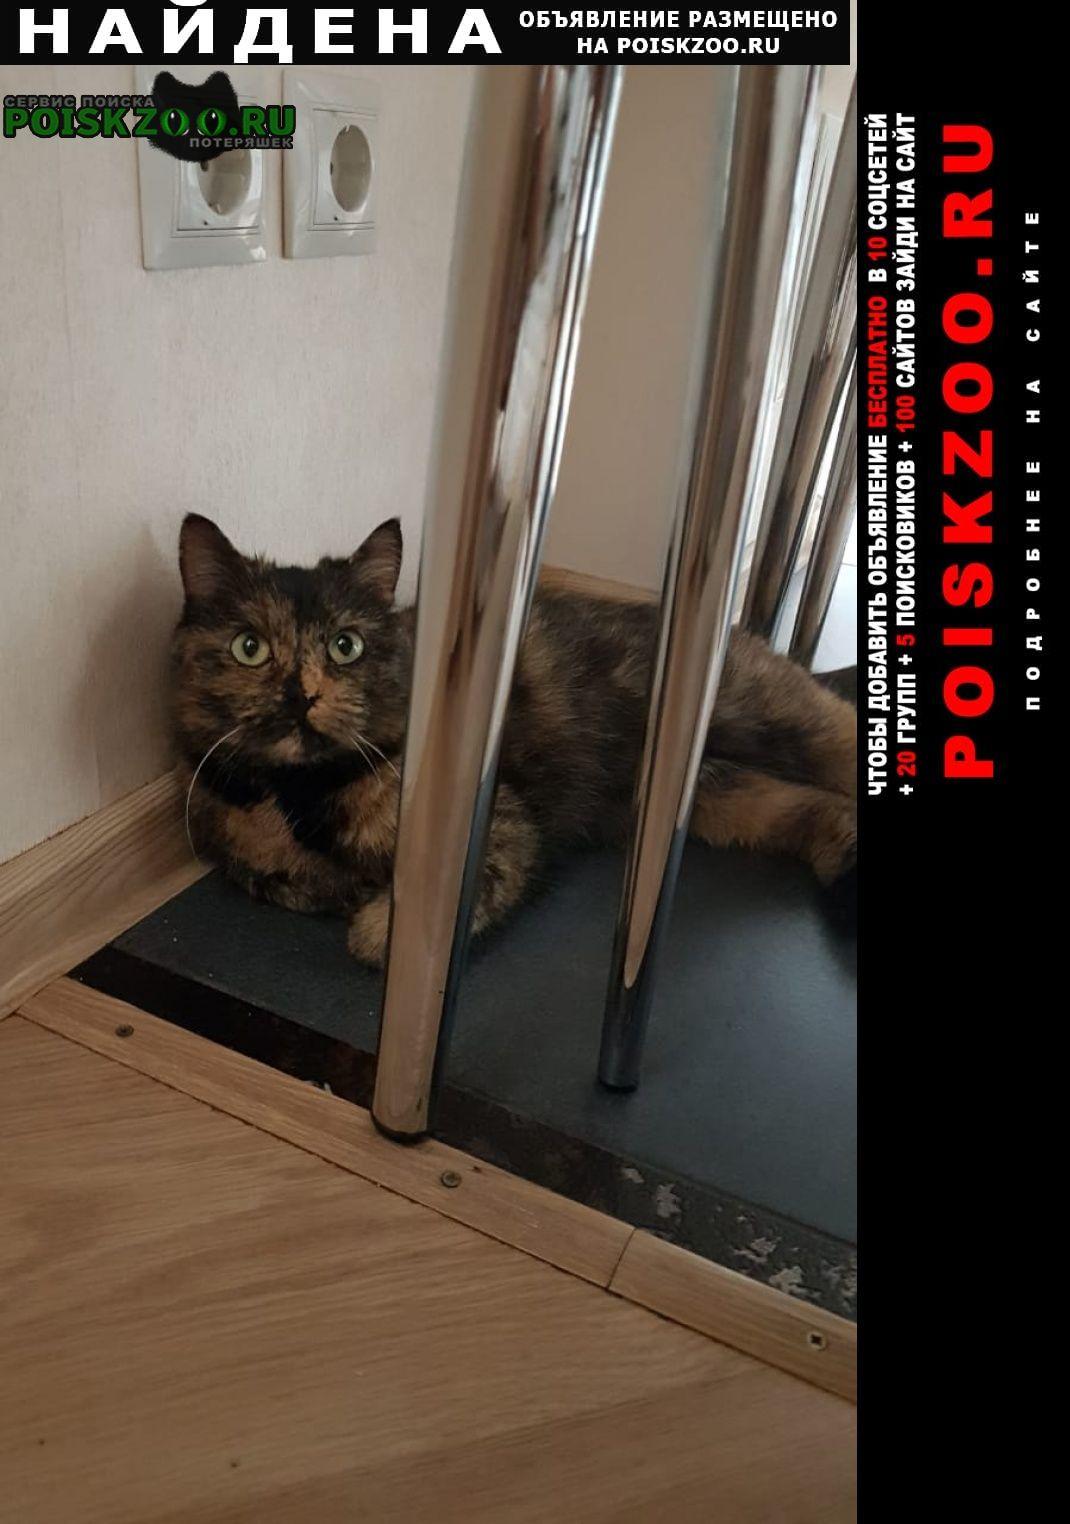 Найдена кошка   около3х лет. домашняя, Омск